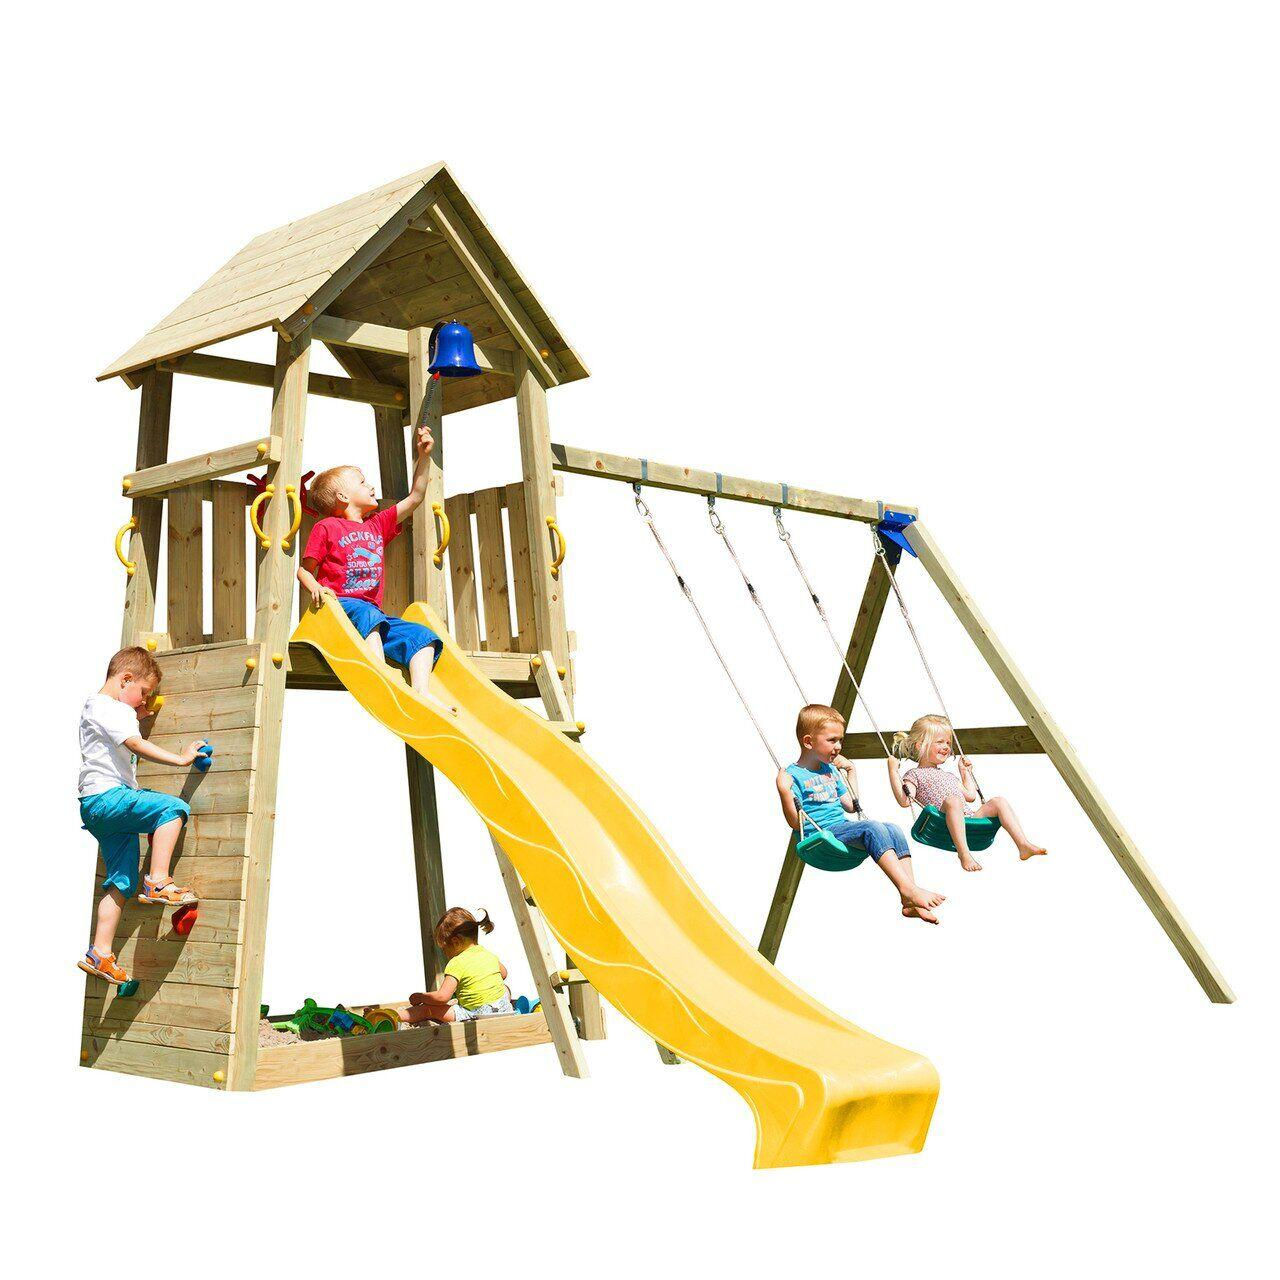 Дитячі майданчики для садочка (дитячого садка) BELVEDERE + SWING